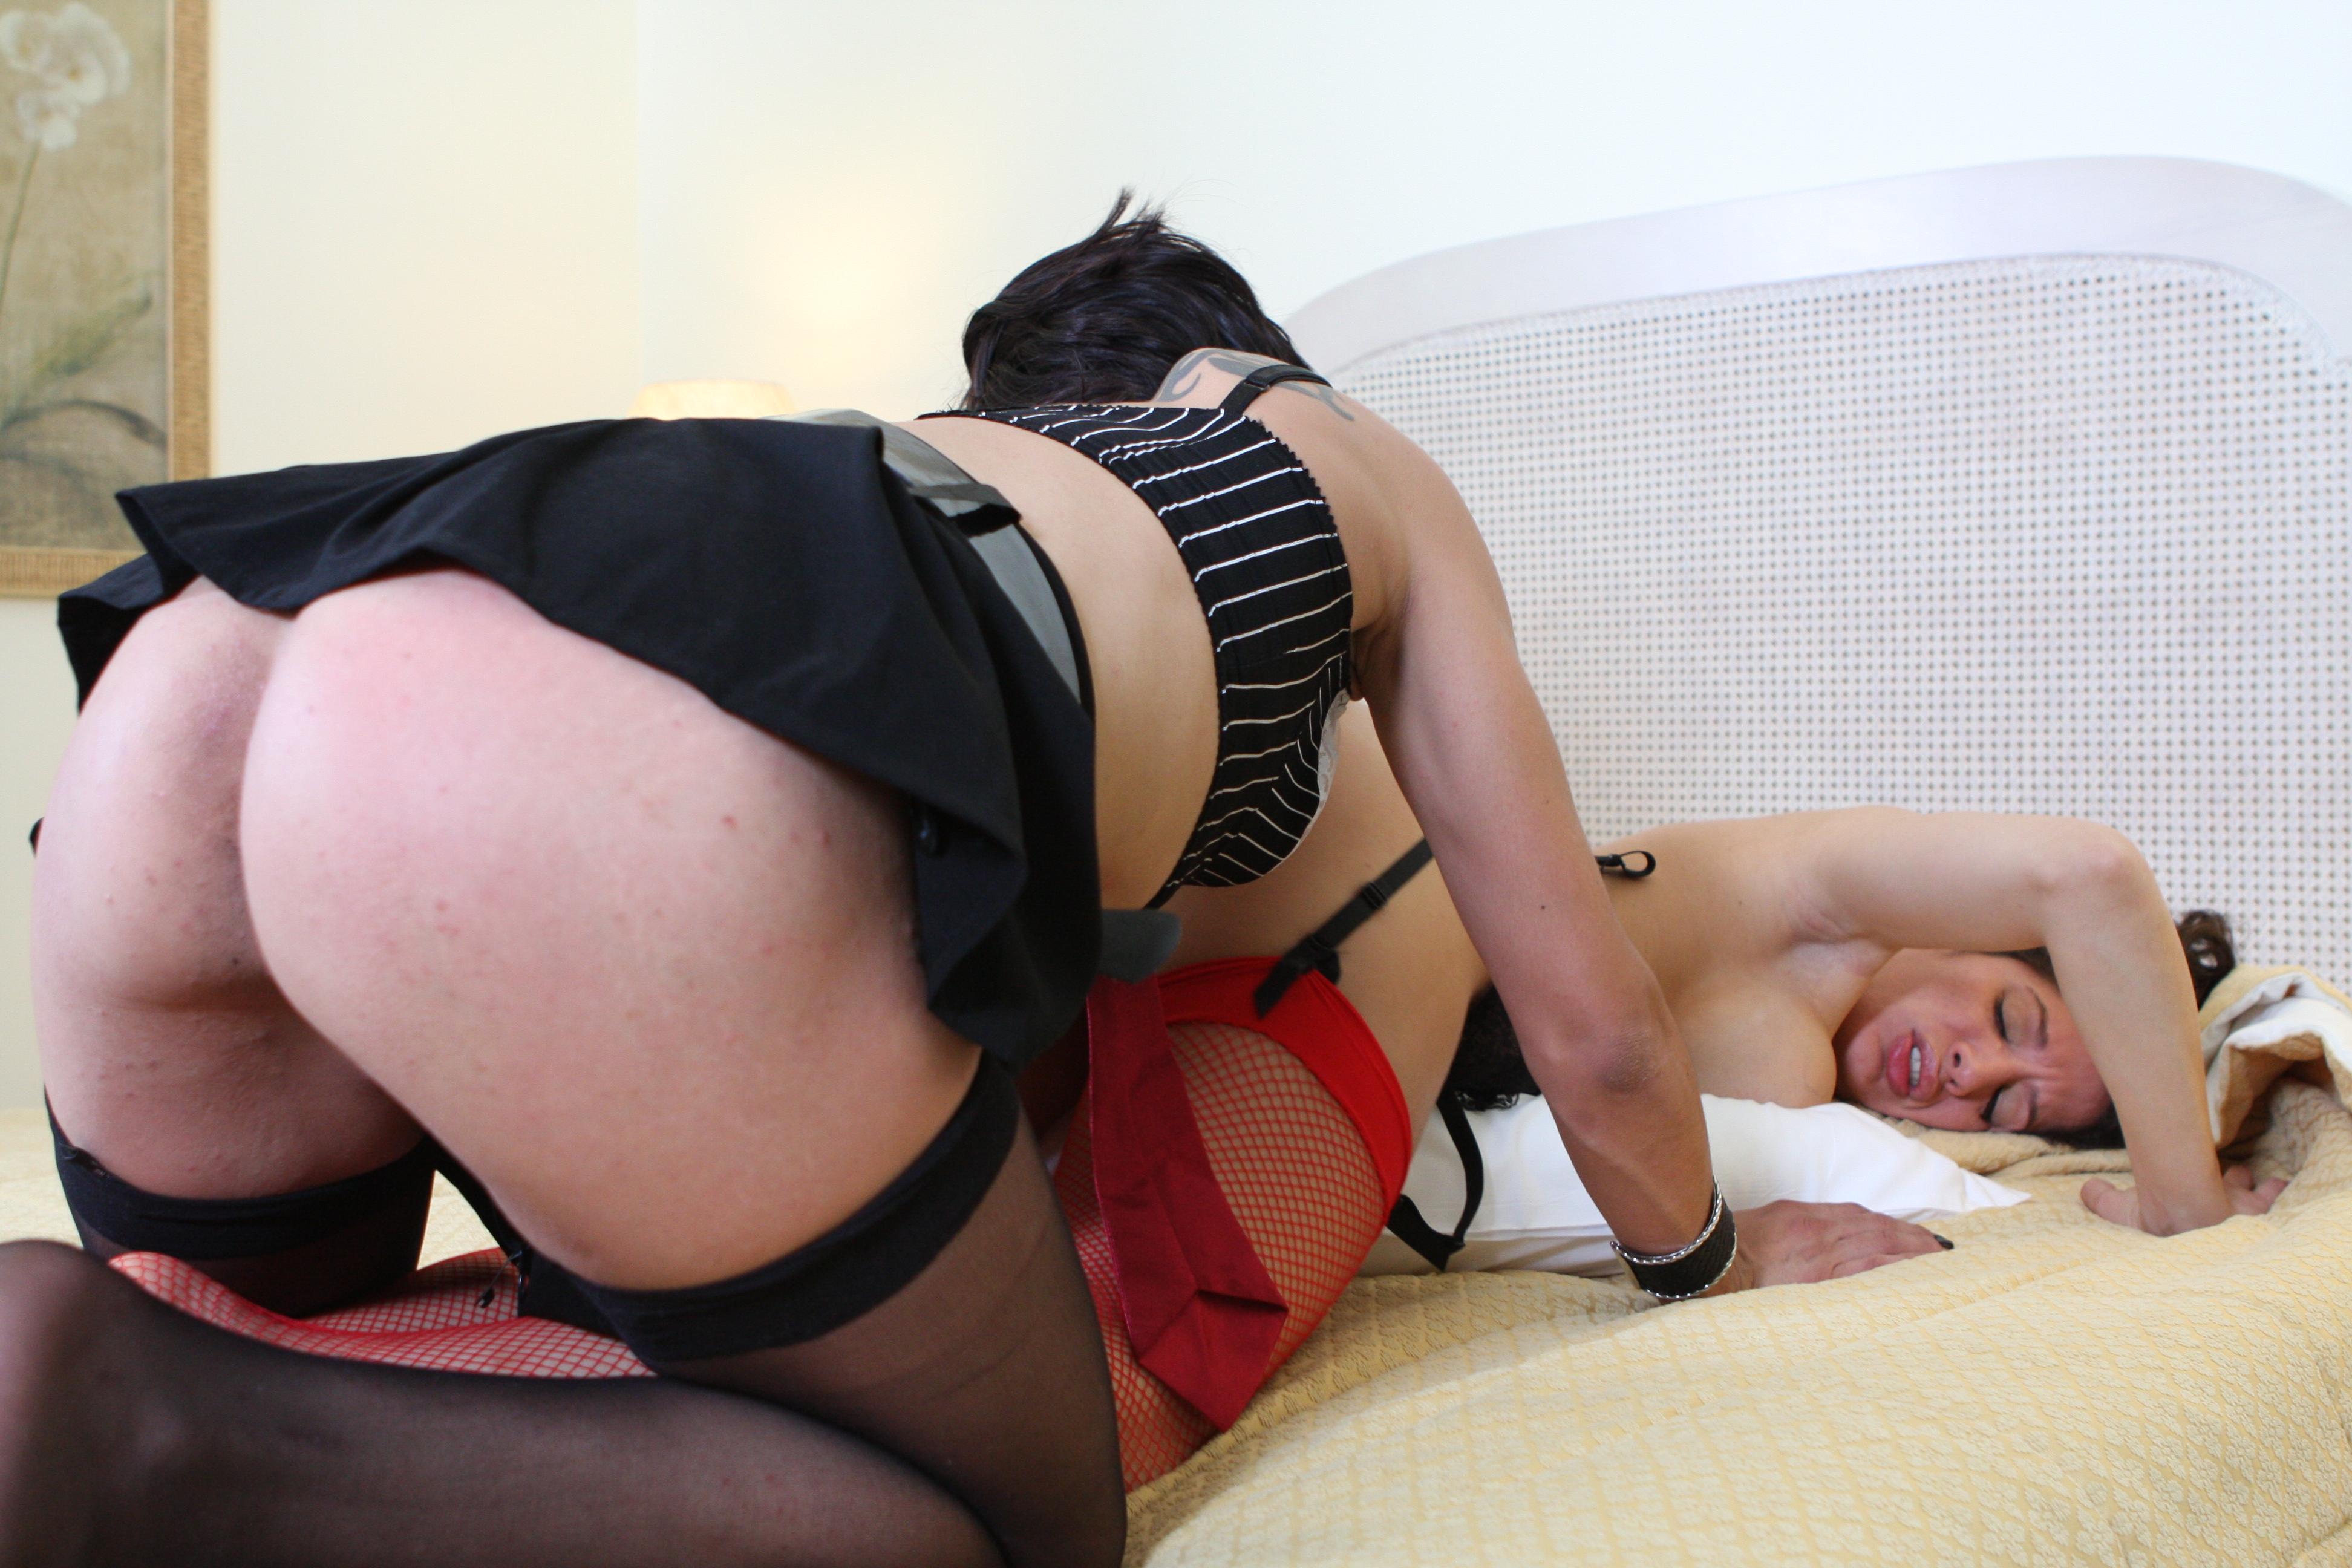 sexo a portuguesa site de lesbicas